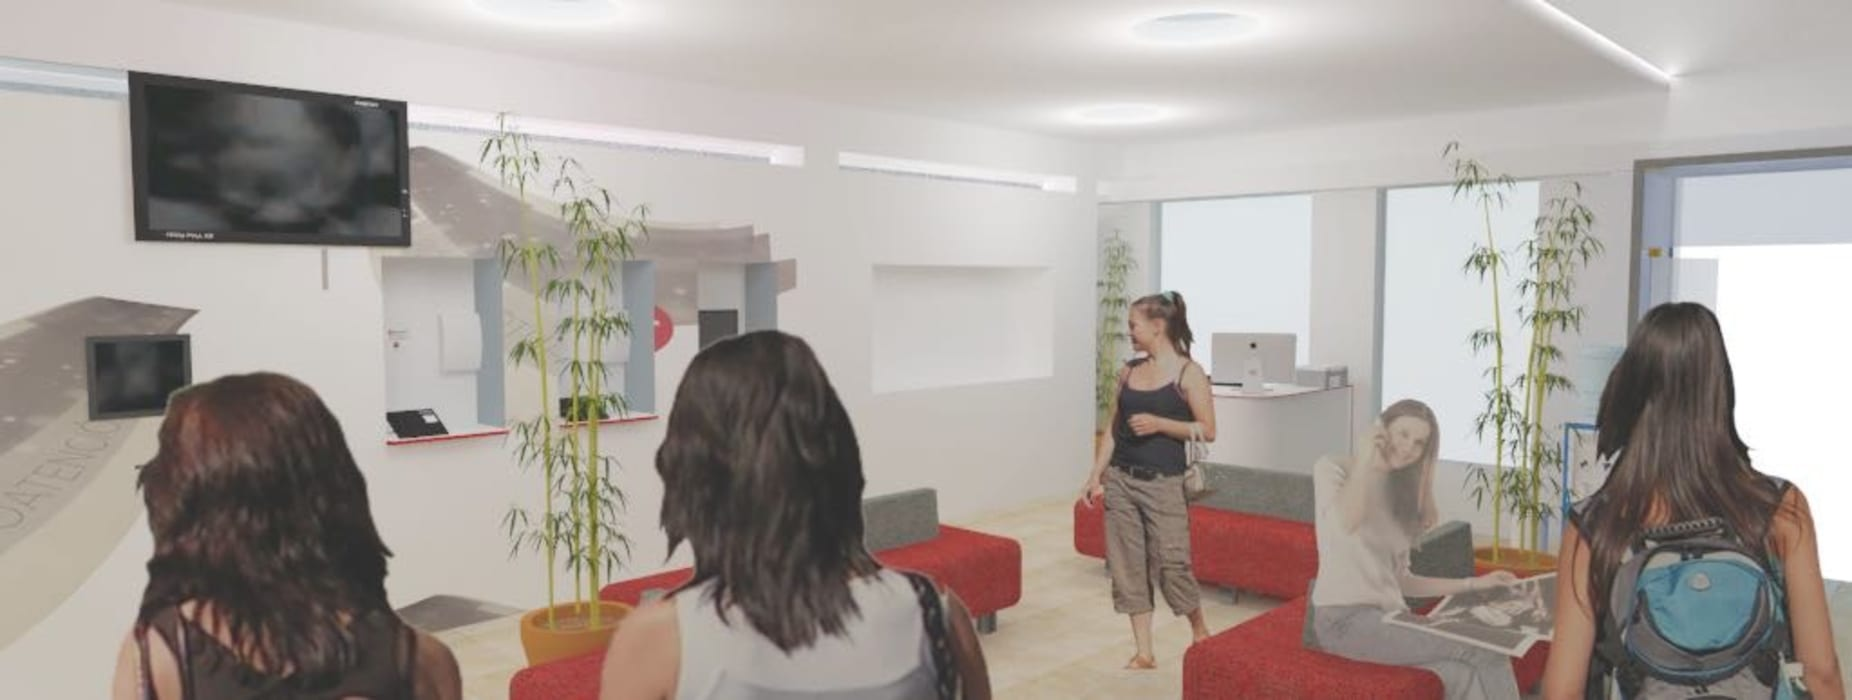 oficina comercial Chilquinta Quilpue de IDEAfactory Moderno Contrachapado